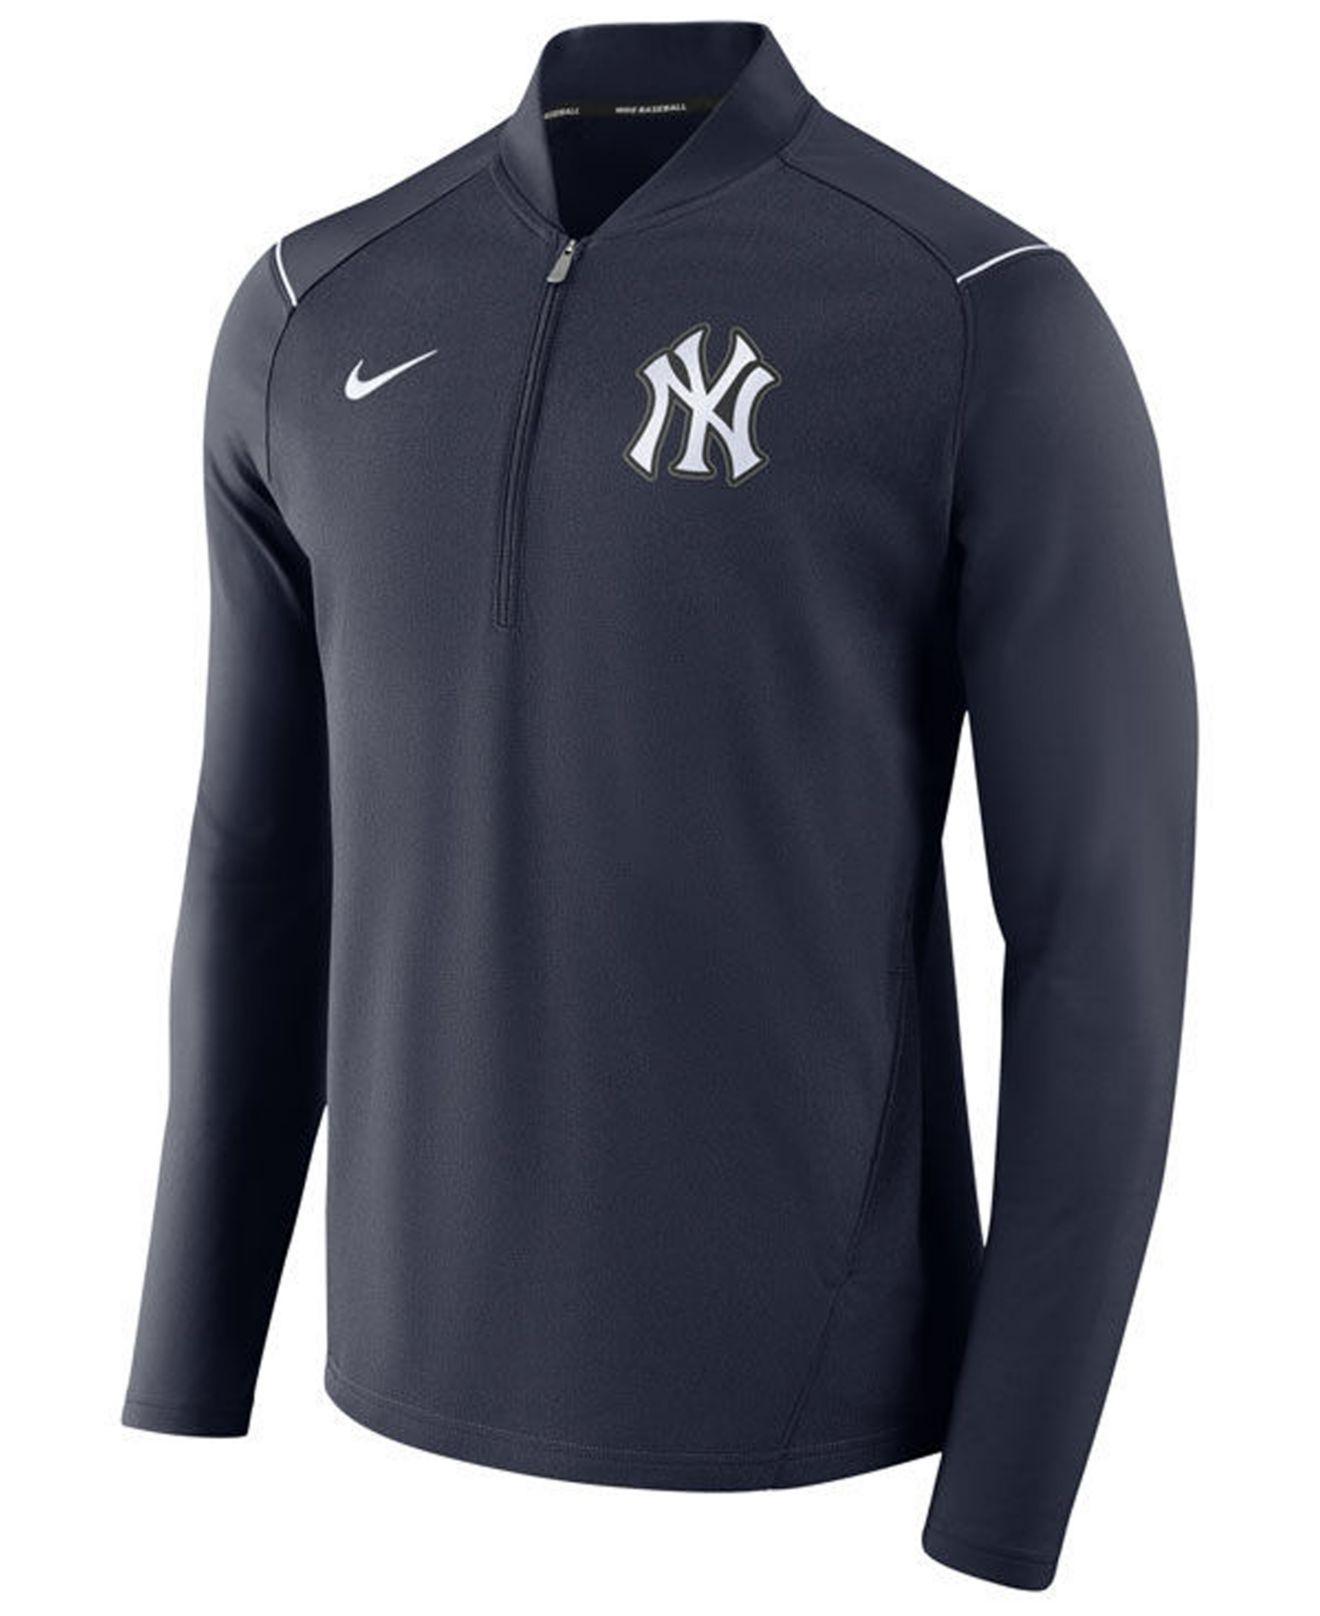 half off fea2f 5623d Men's Blue New York Yankees Dry Elite Half-zip Pullover